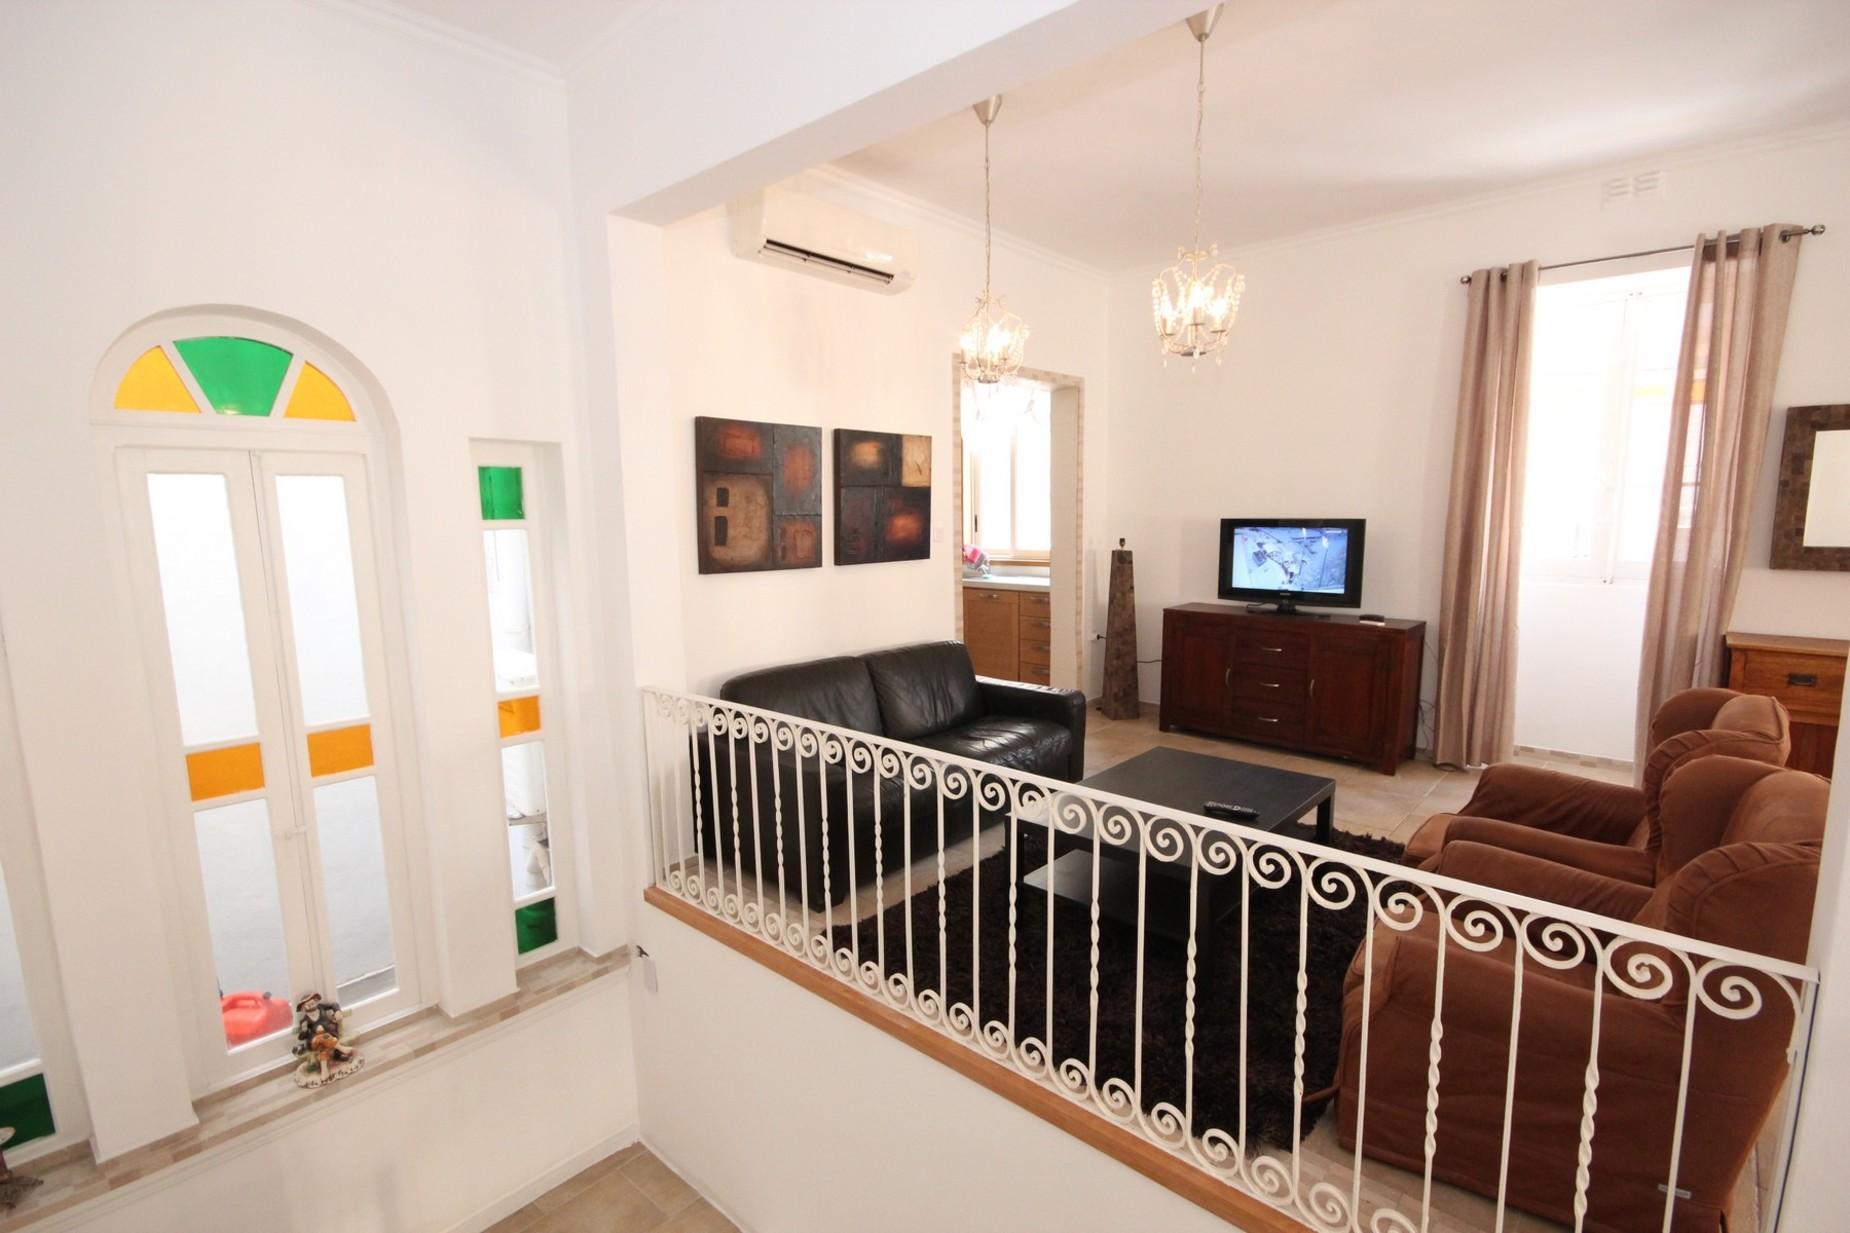 3 bed Town House For Rent in Gzira, Gzira - thumb 9